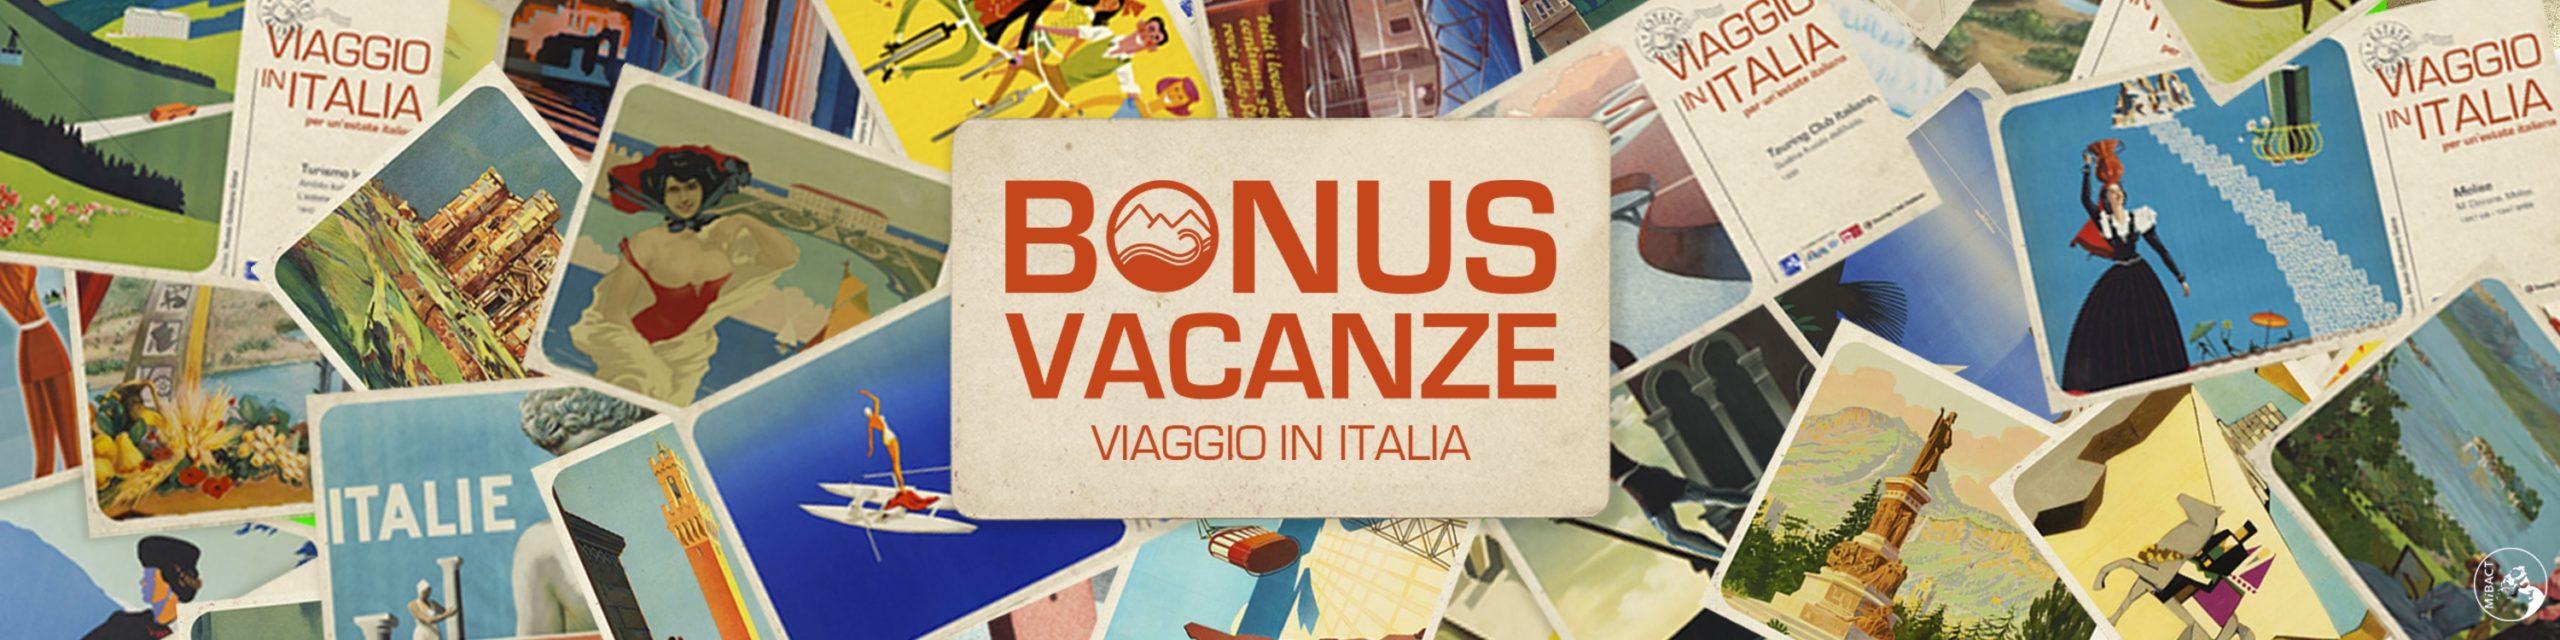 copertina opuscolo ufficiale bonus vacanze